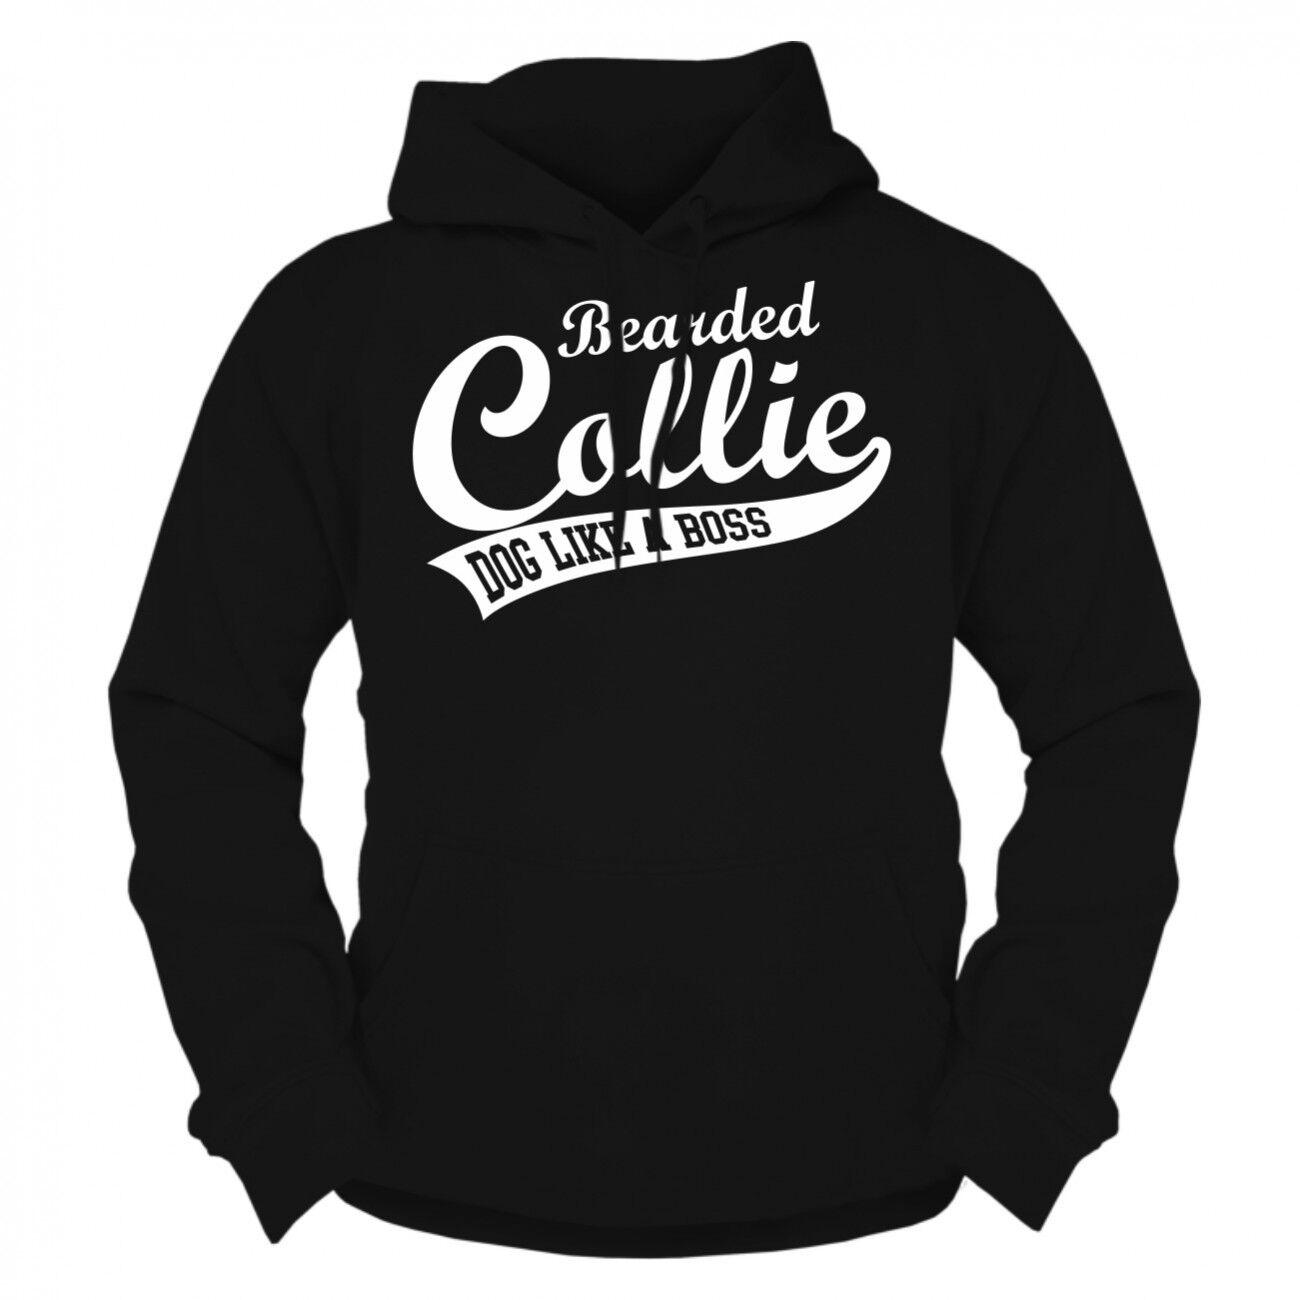 Kapuzenpullover Sweatshirt Hoodie Bearded Collie rasse züchter hundehalter dog